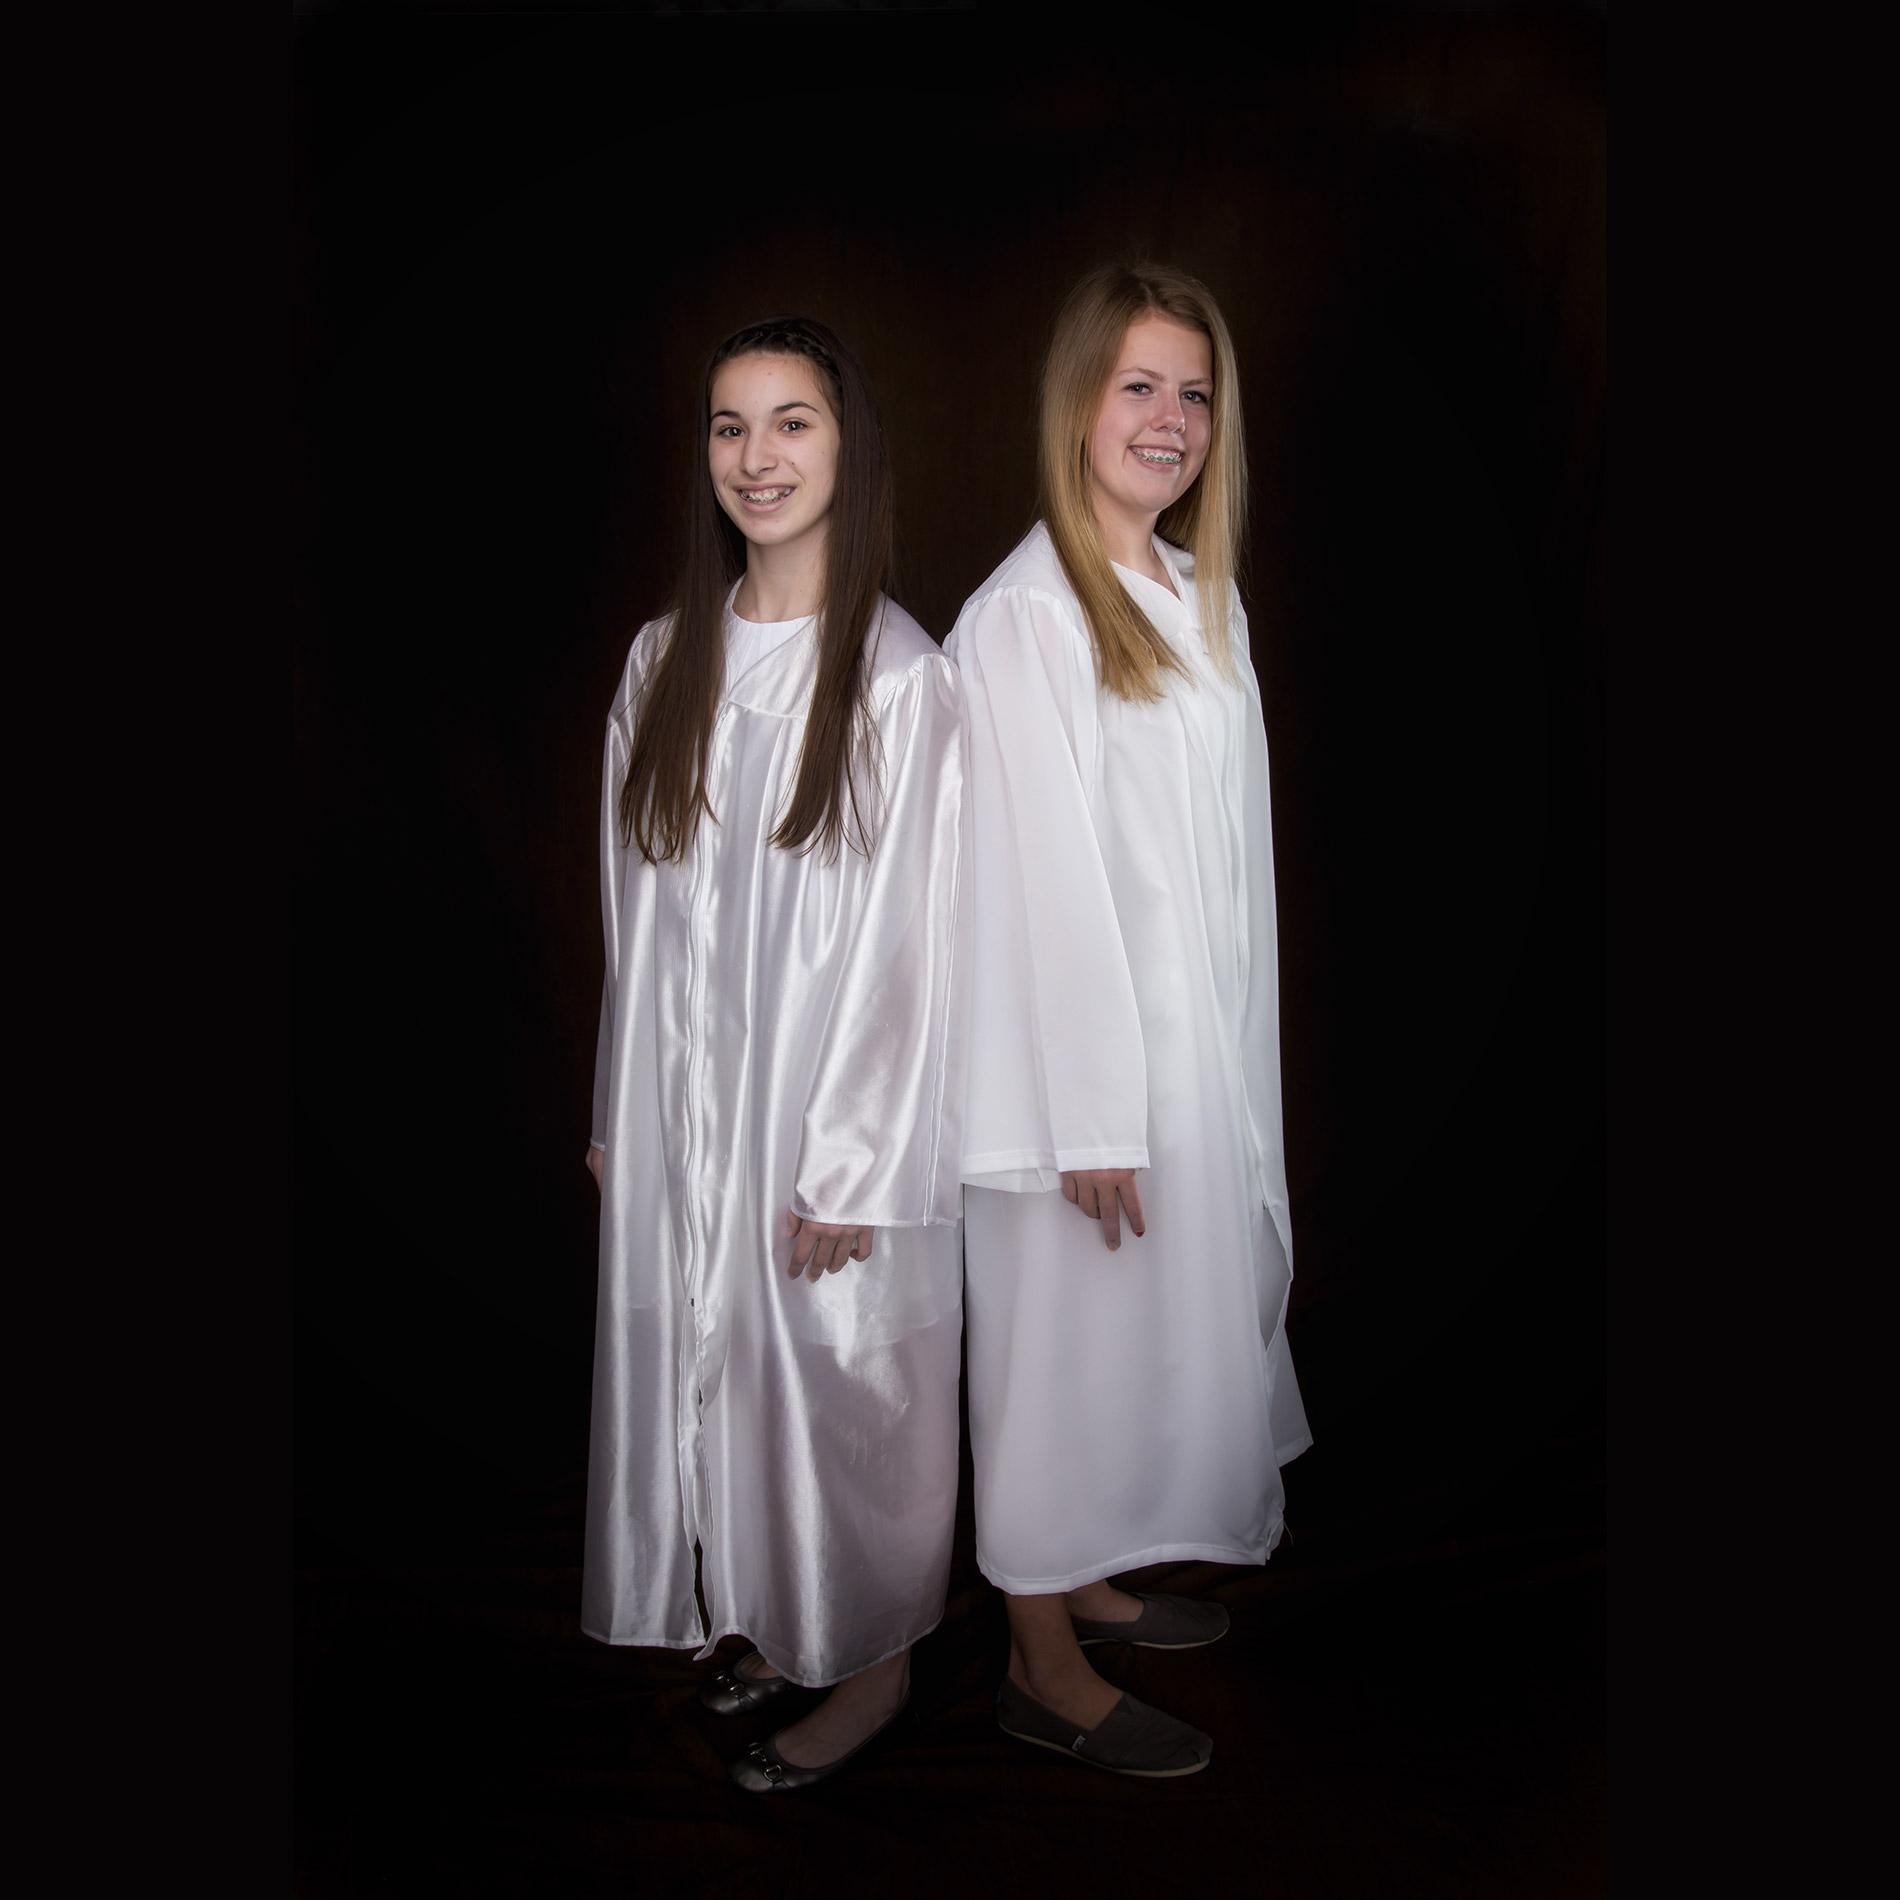 Confirmation-Portraits-03129-63f